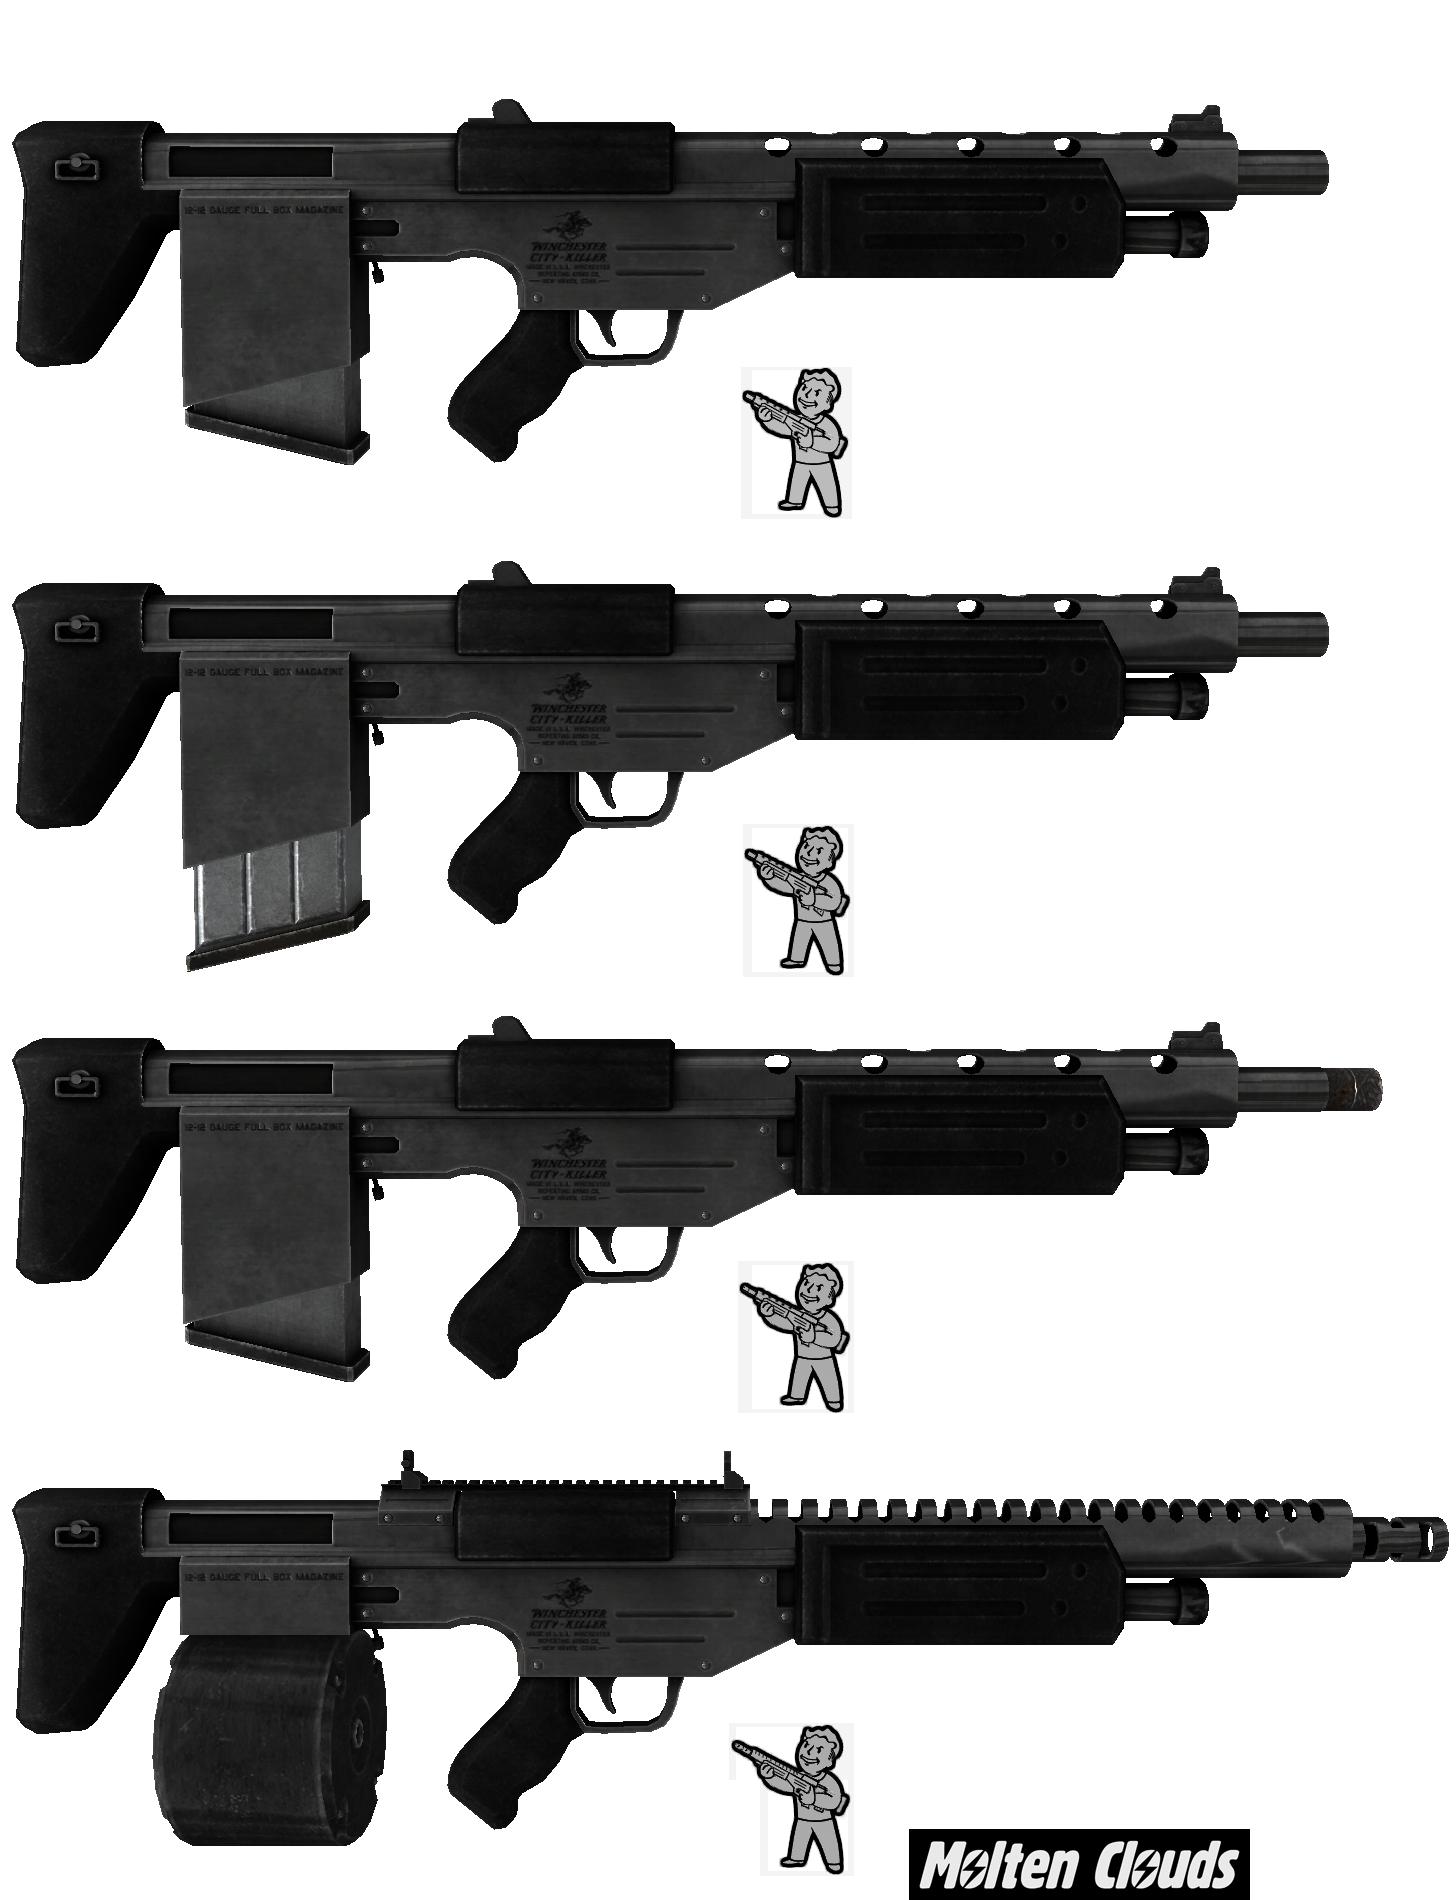 Combat Shotgun image - The Chosen's Way mod for Fallout: New